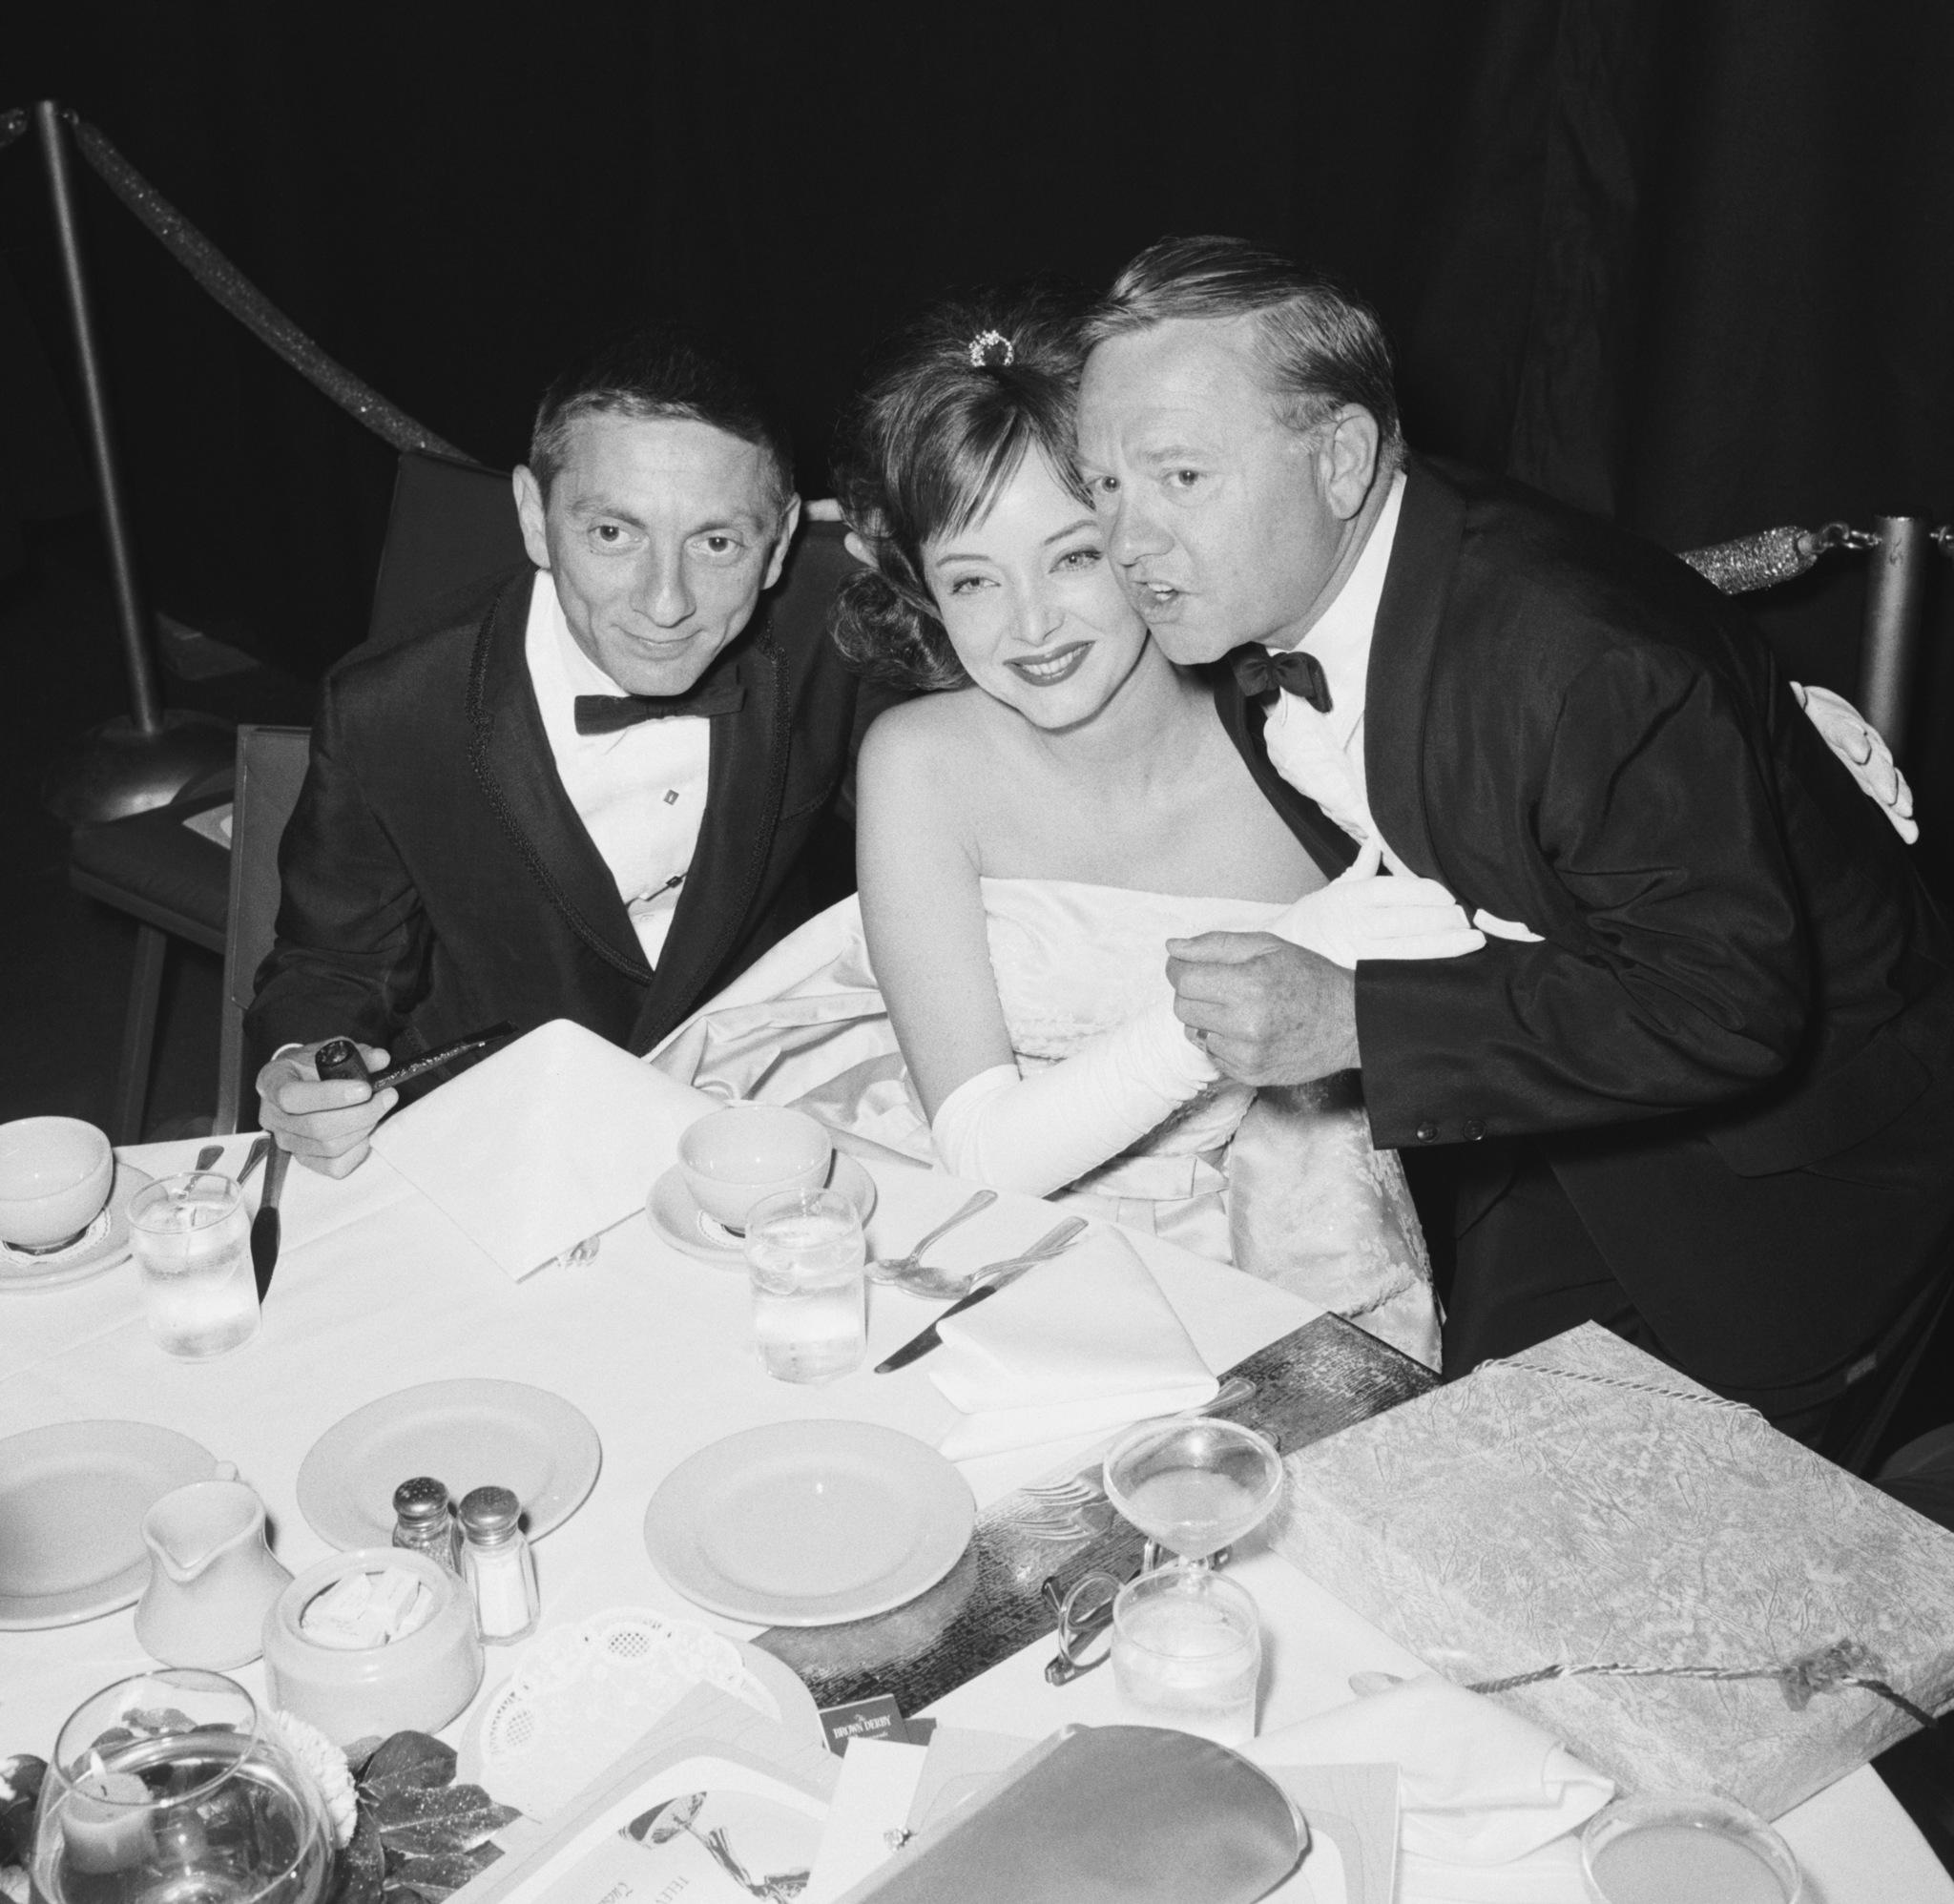 Mickey Rooney, Aaron Spelling, and Carolyn Jones